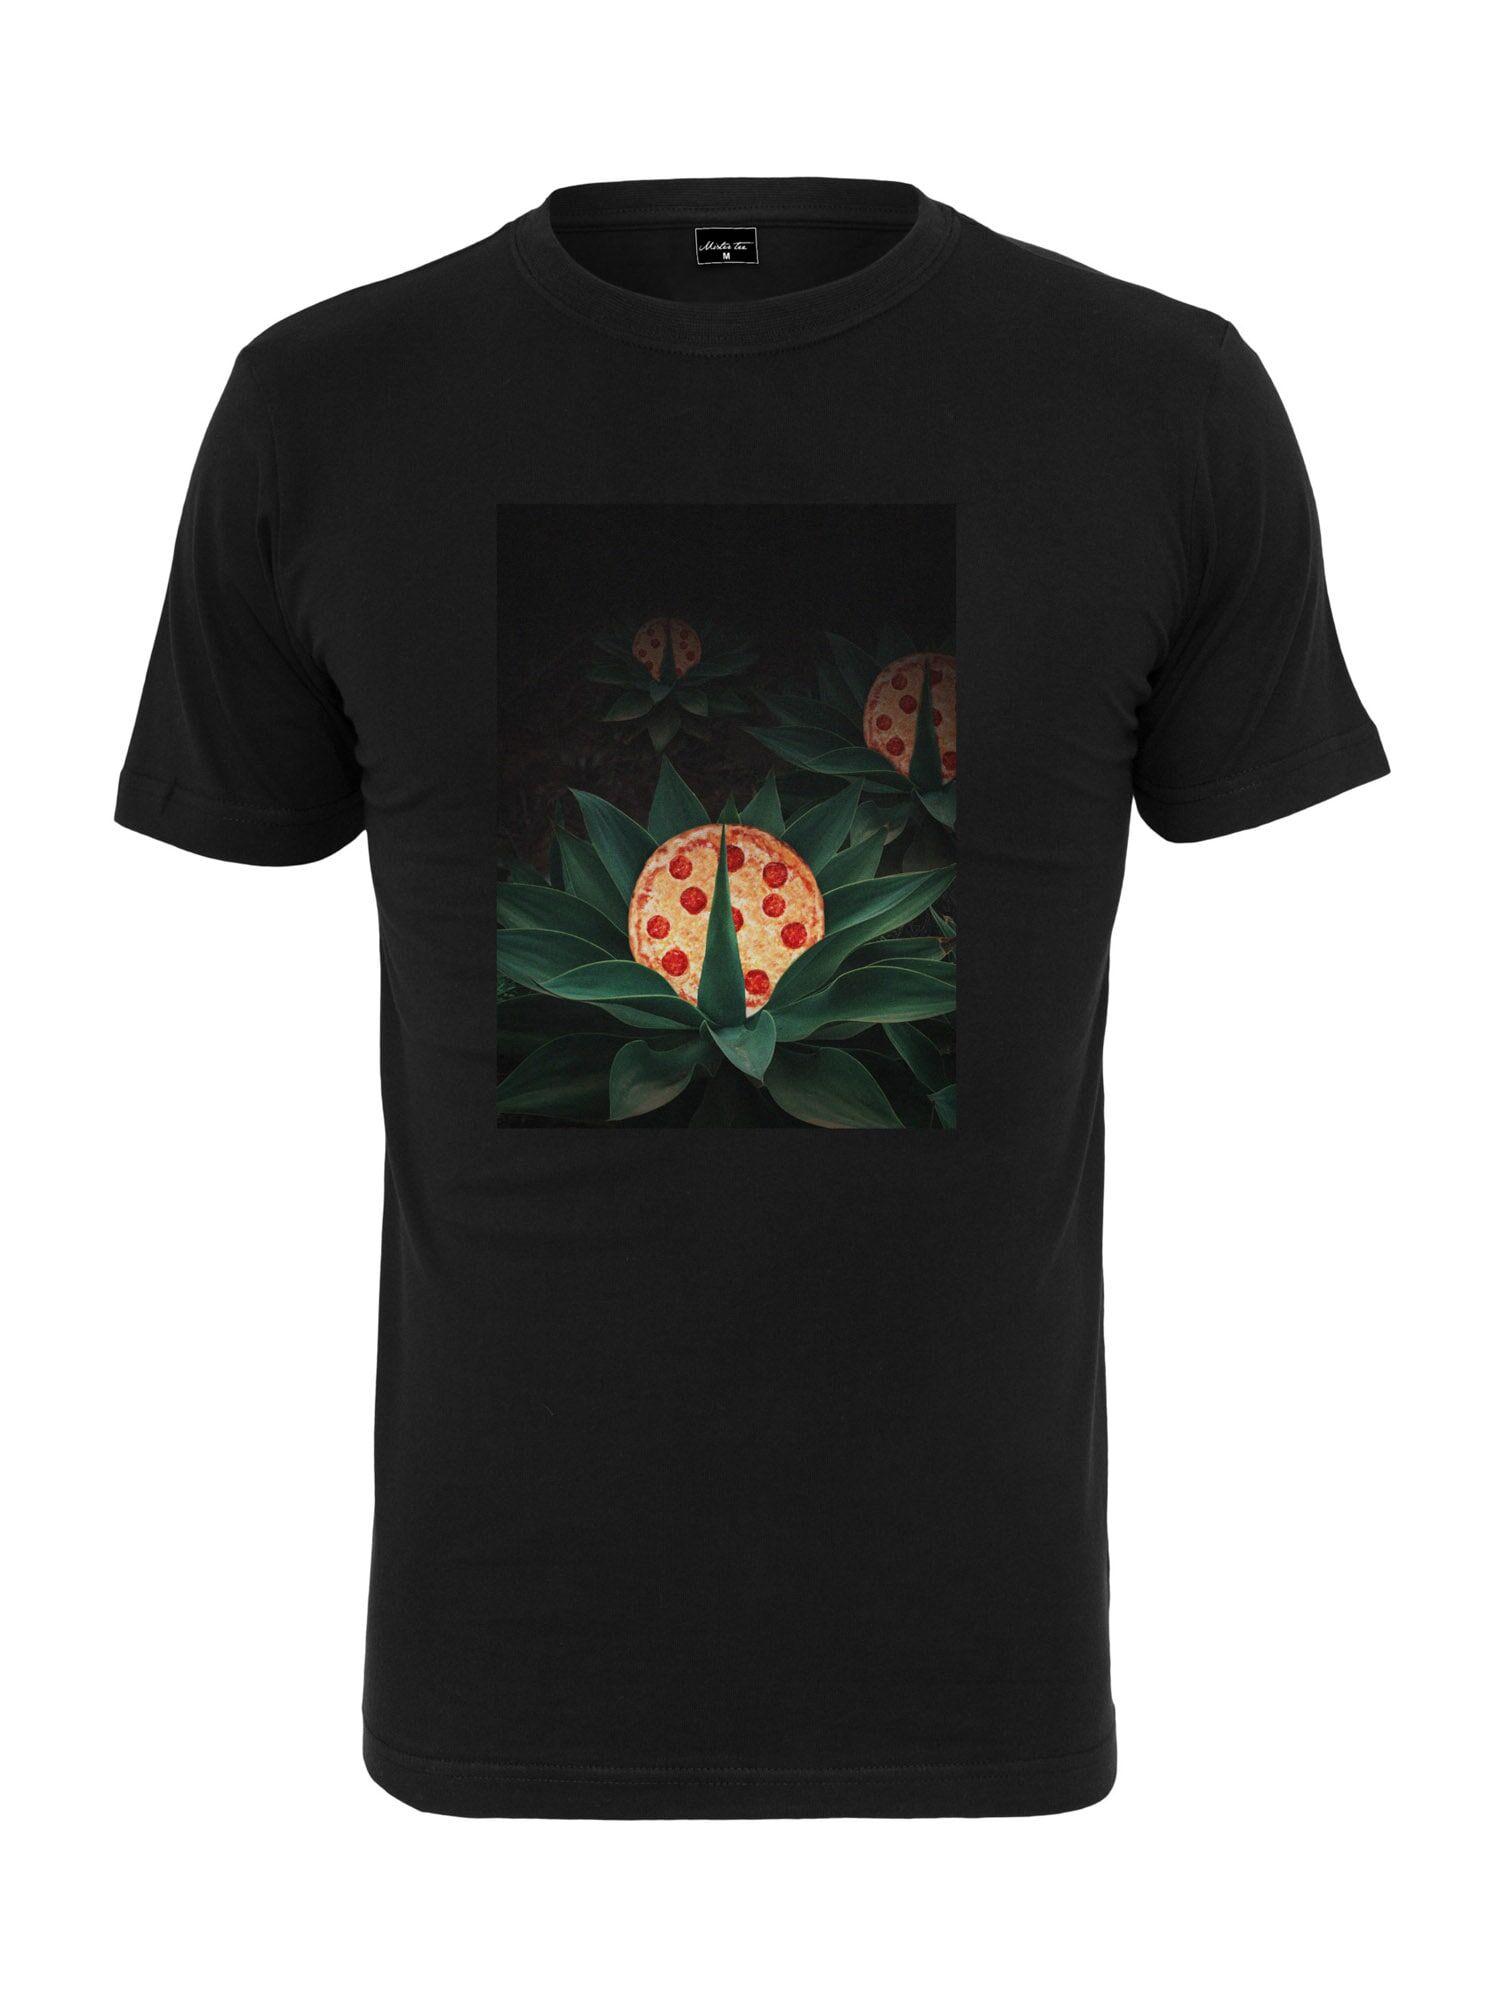 Tee T-Shirt 'Pizza Plant'  - Noir - Taille: XXL - male